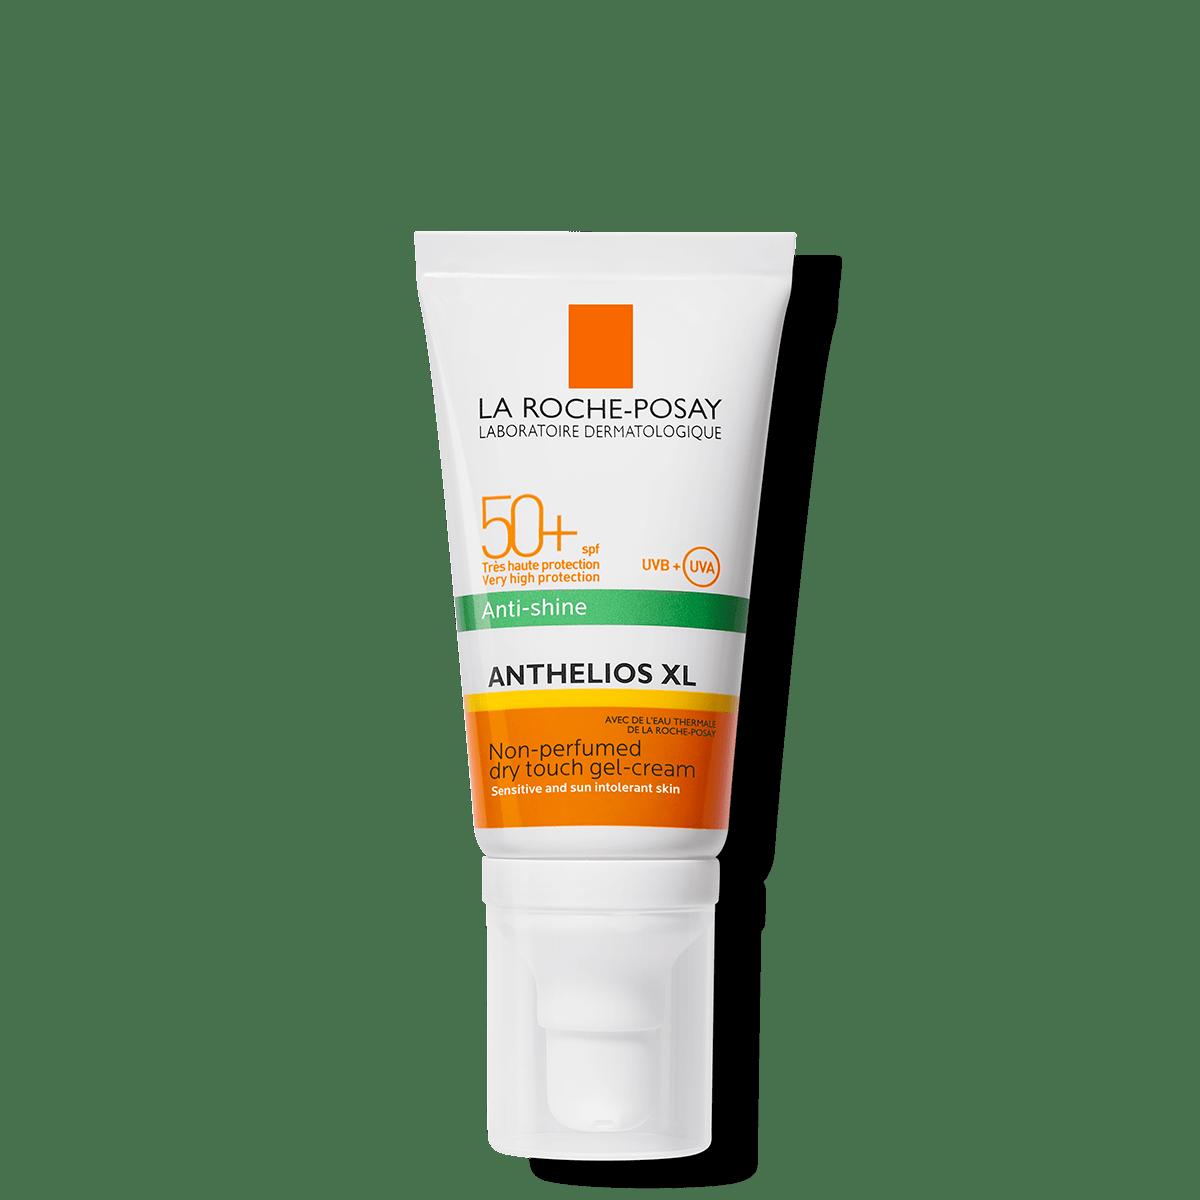 La Roche Posay ProduktSide Sol Anthelios XL Tørrer hurtigt Gelcreme Spf50